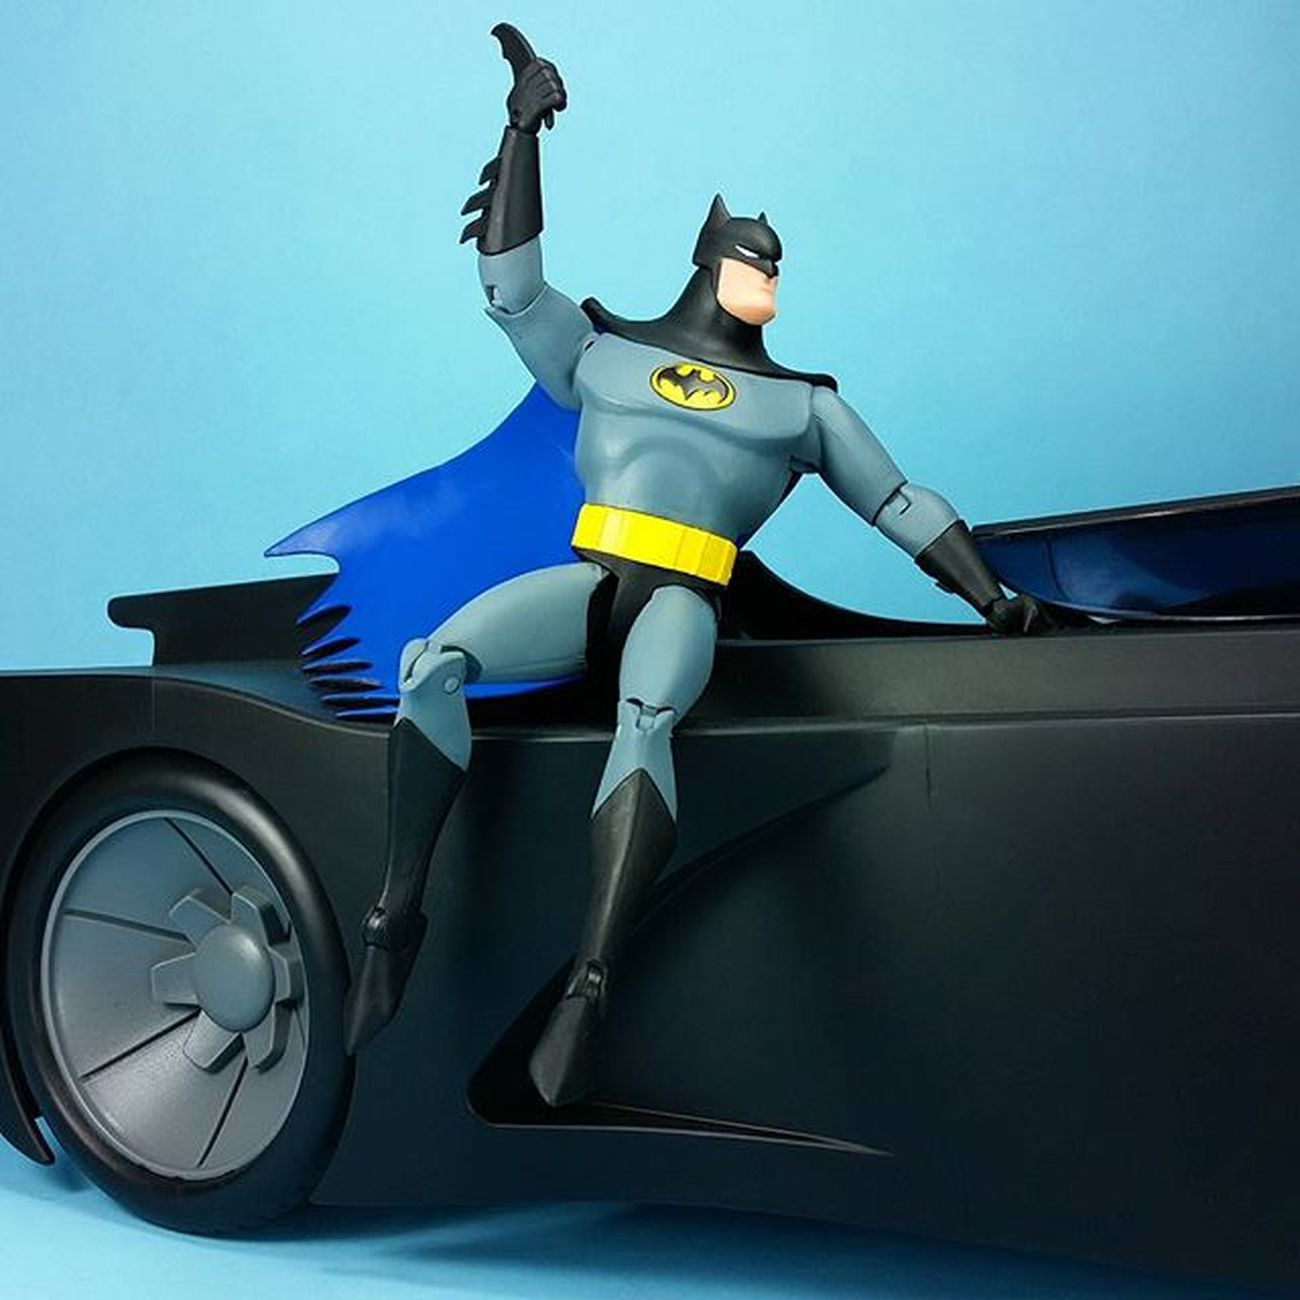 It's nice to finally have proper toys of my favorite version of Batman. BatmanTheAnimatedSeries BTAS Batman Batmobile